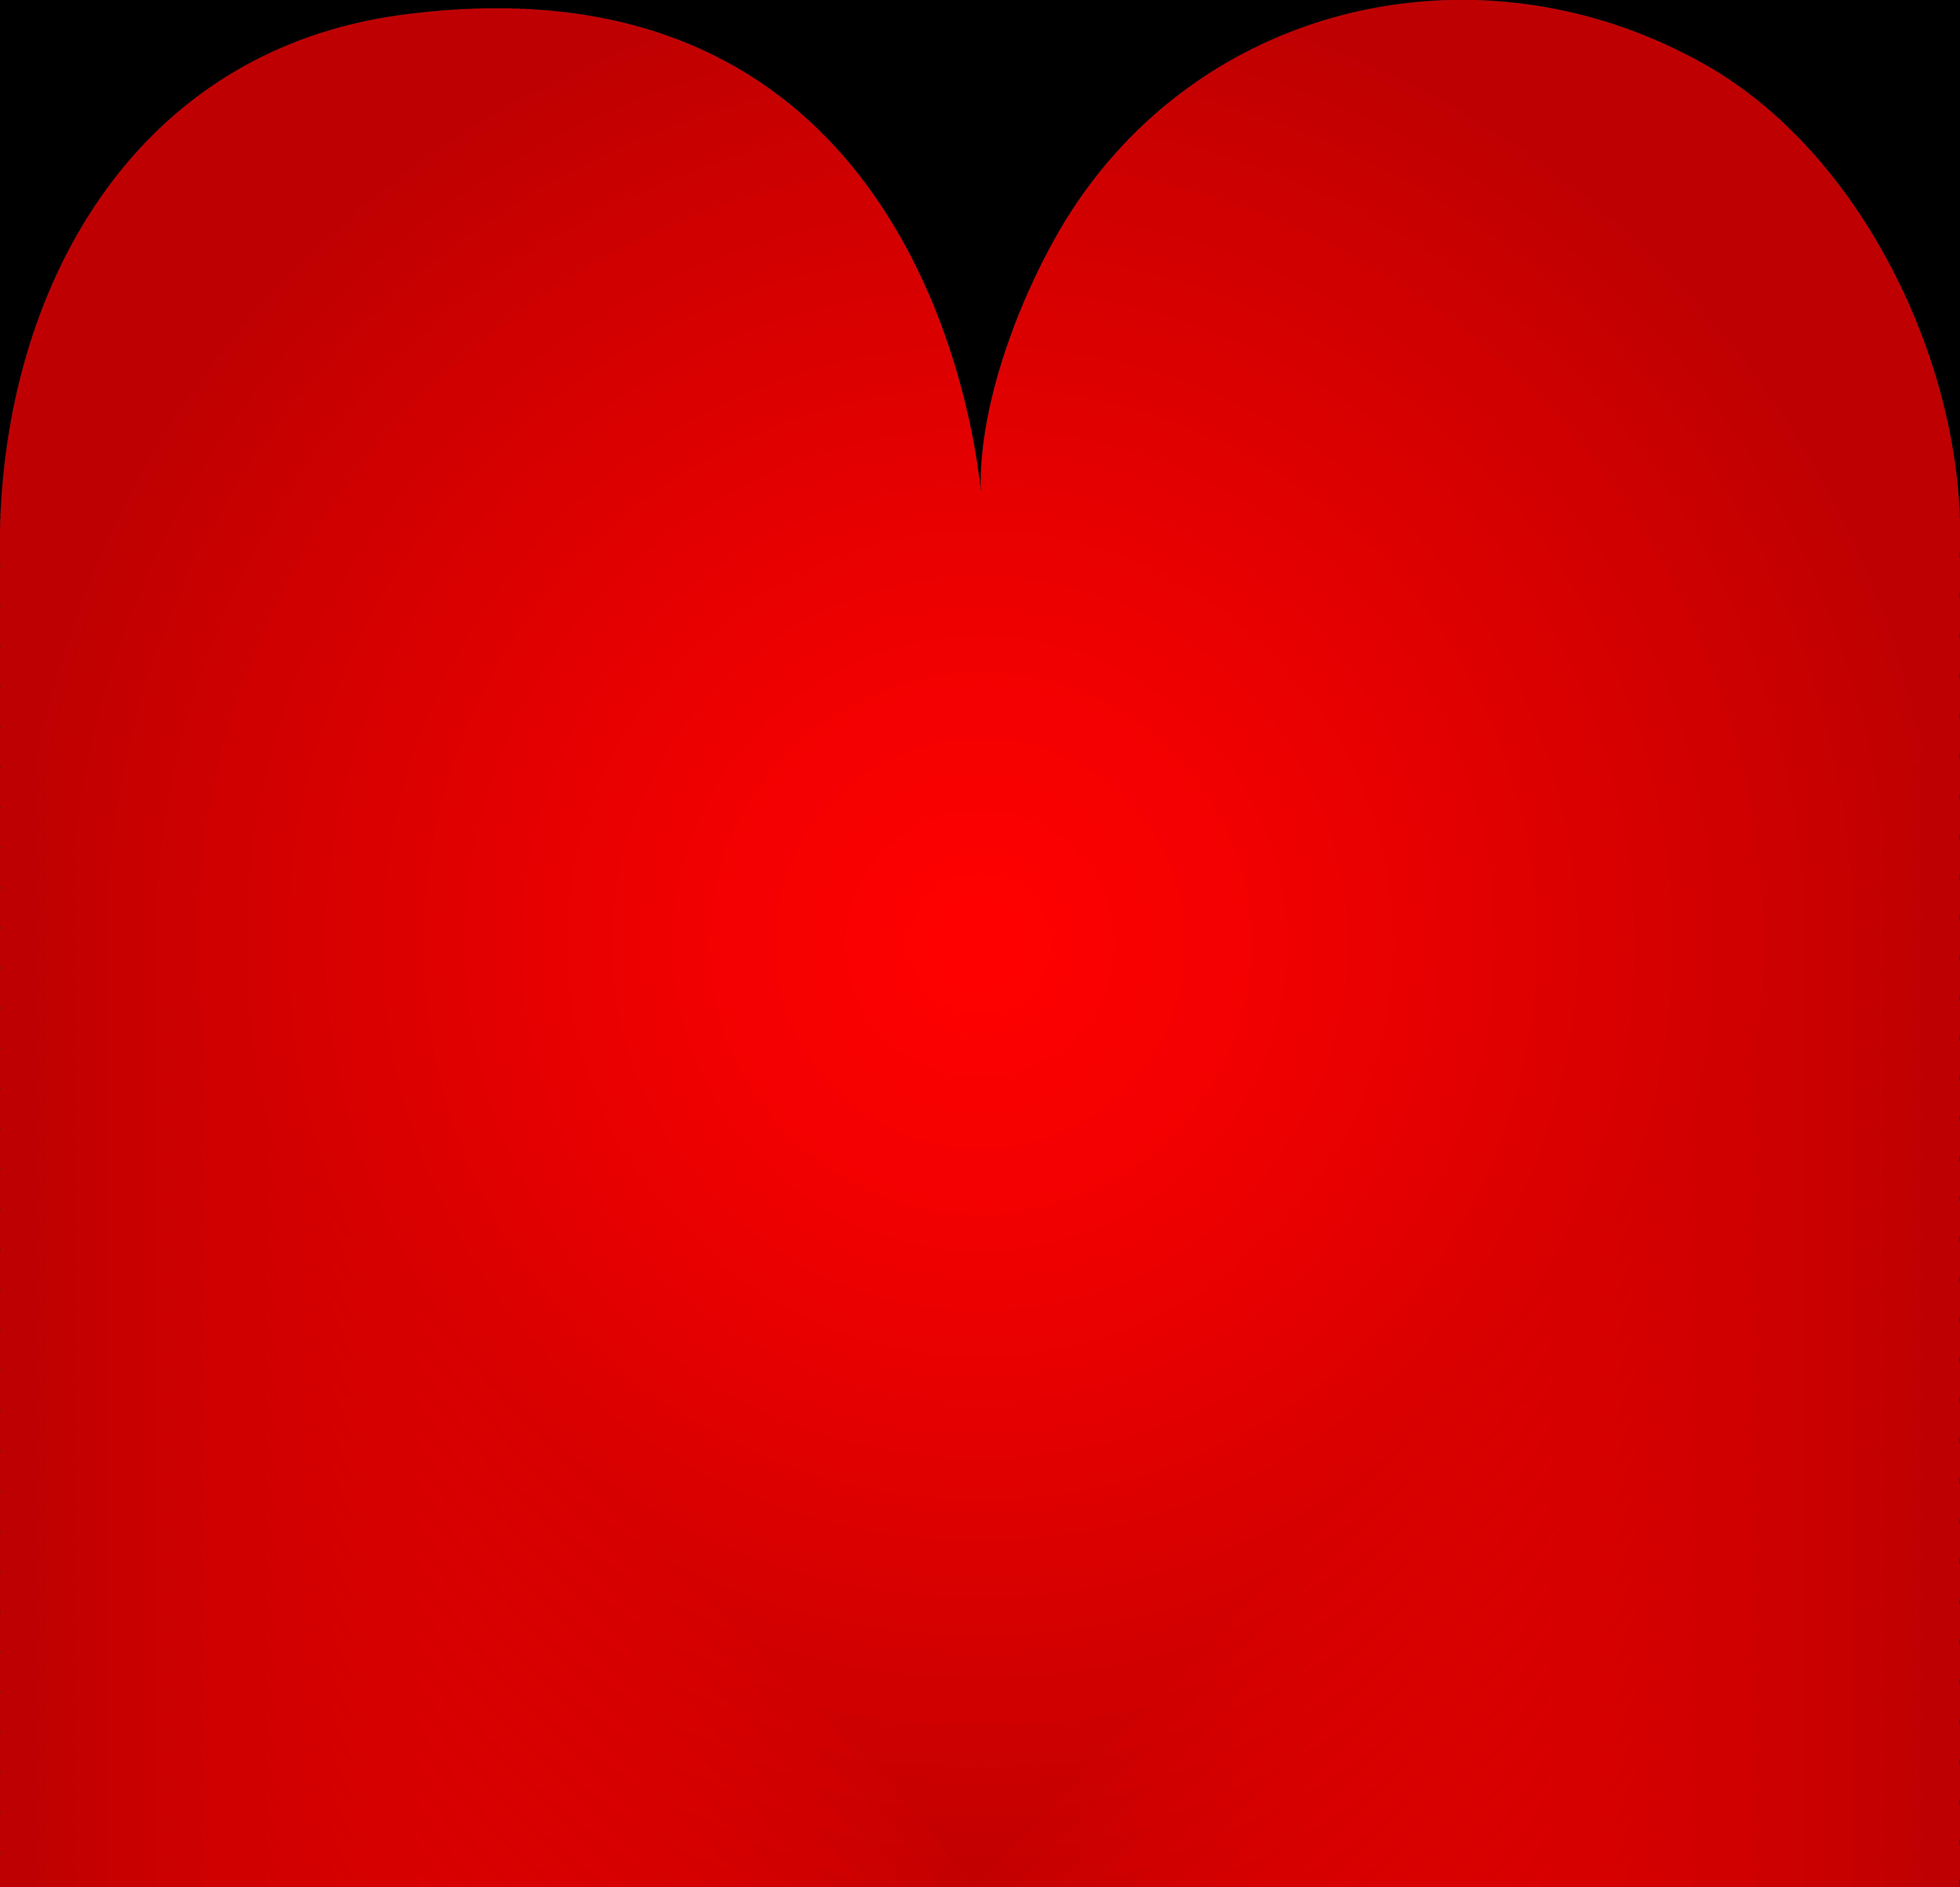 Heart Cartoon Images